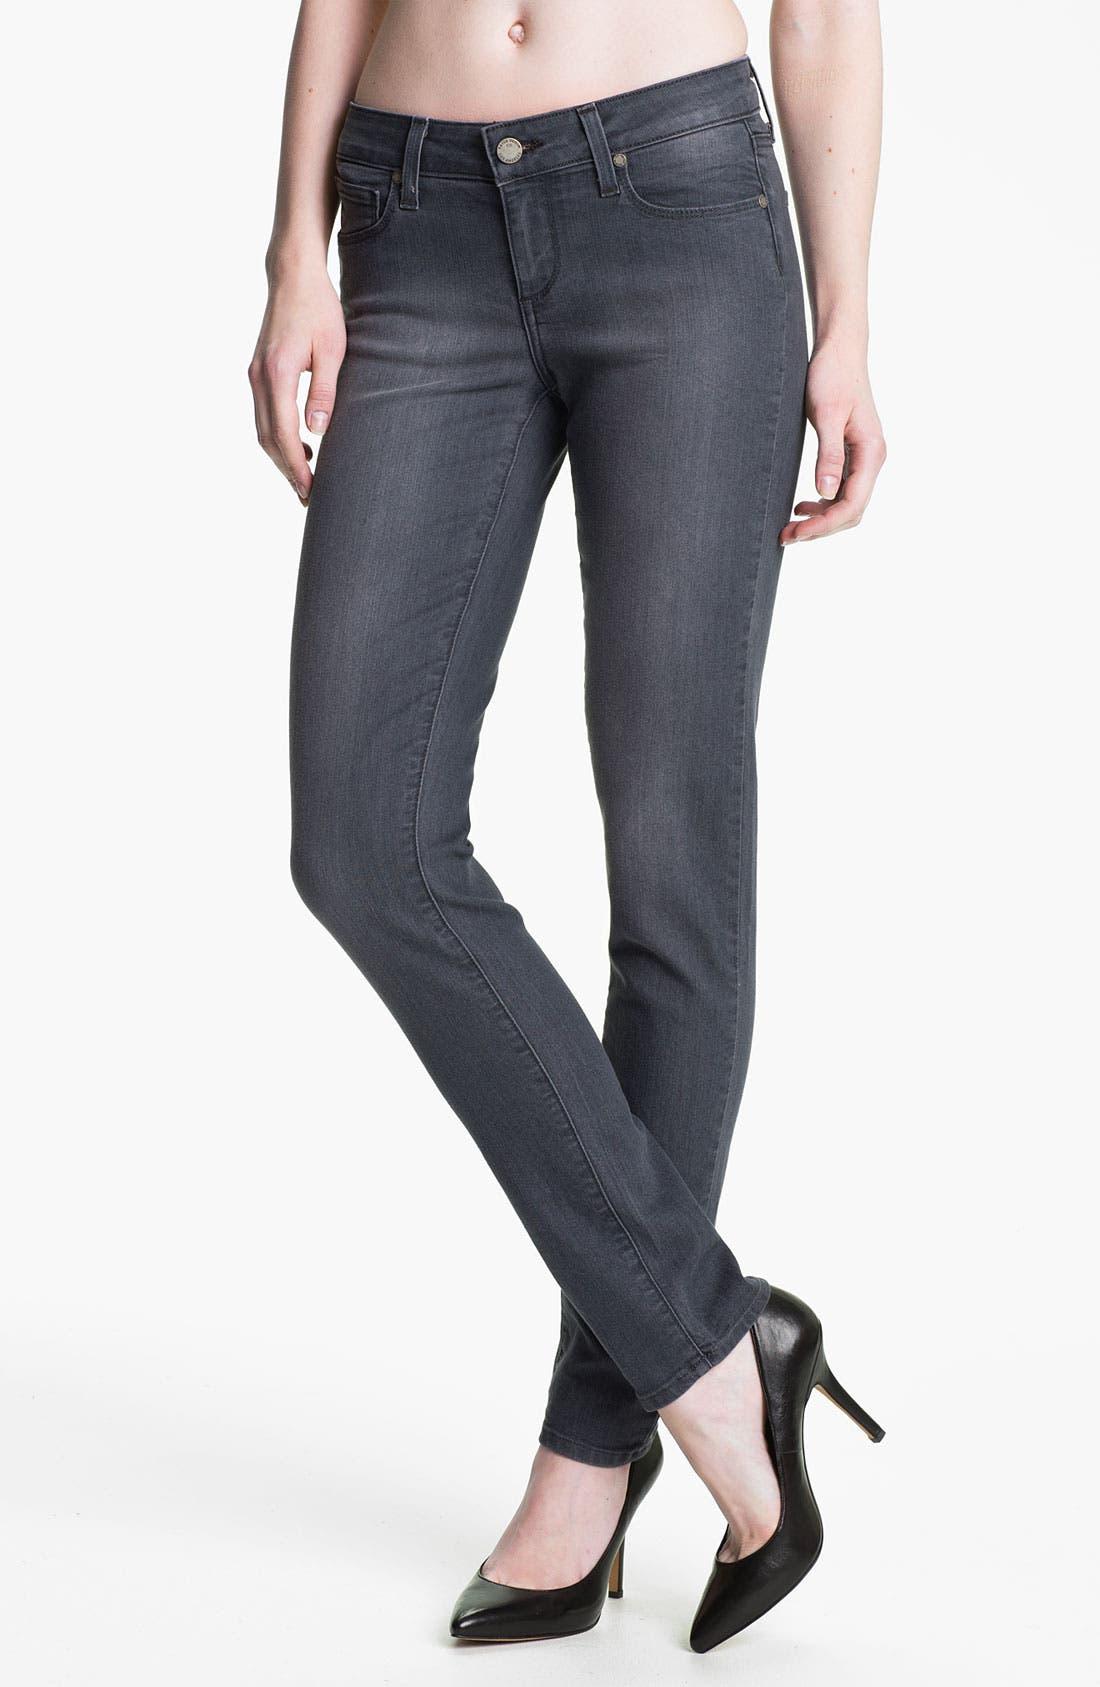 Alternate Image 1 Selected - Paige Denim 'Skyline' Skinny Stretch Jeans (Granite)